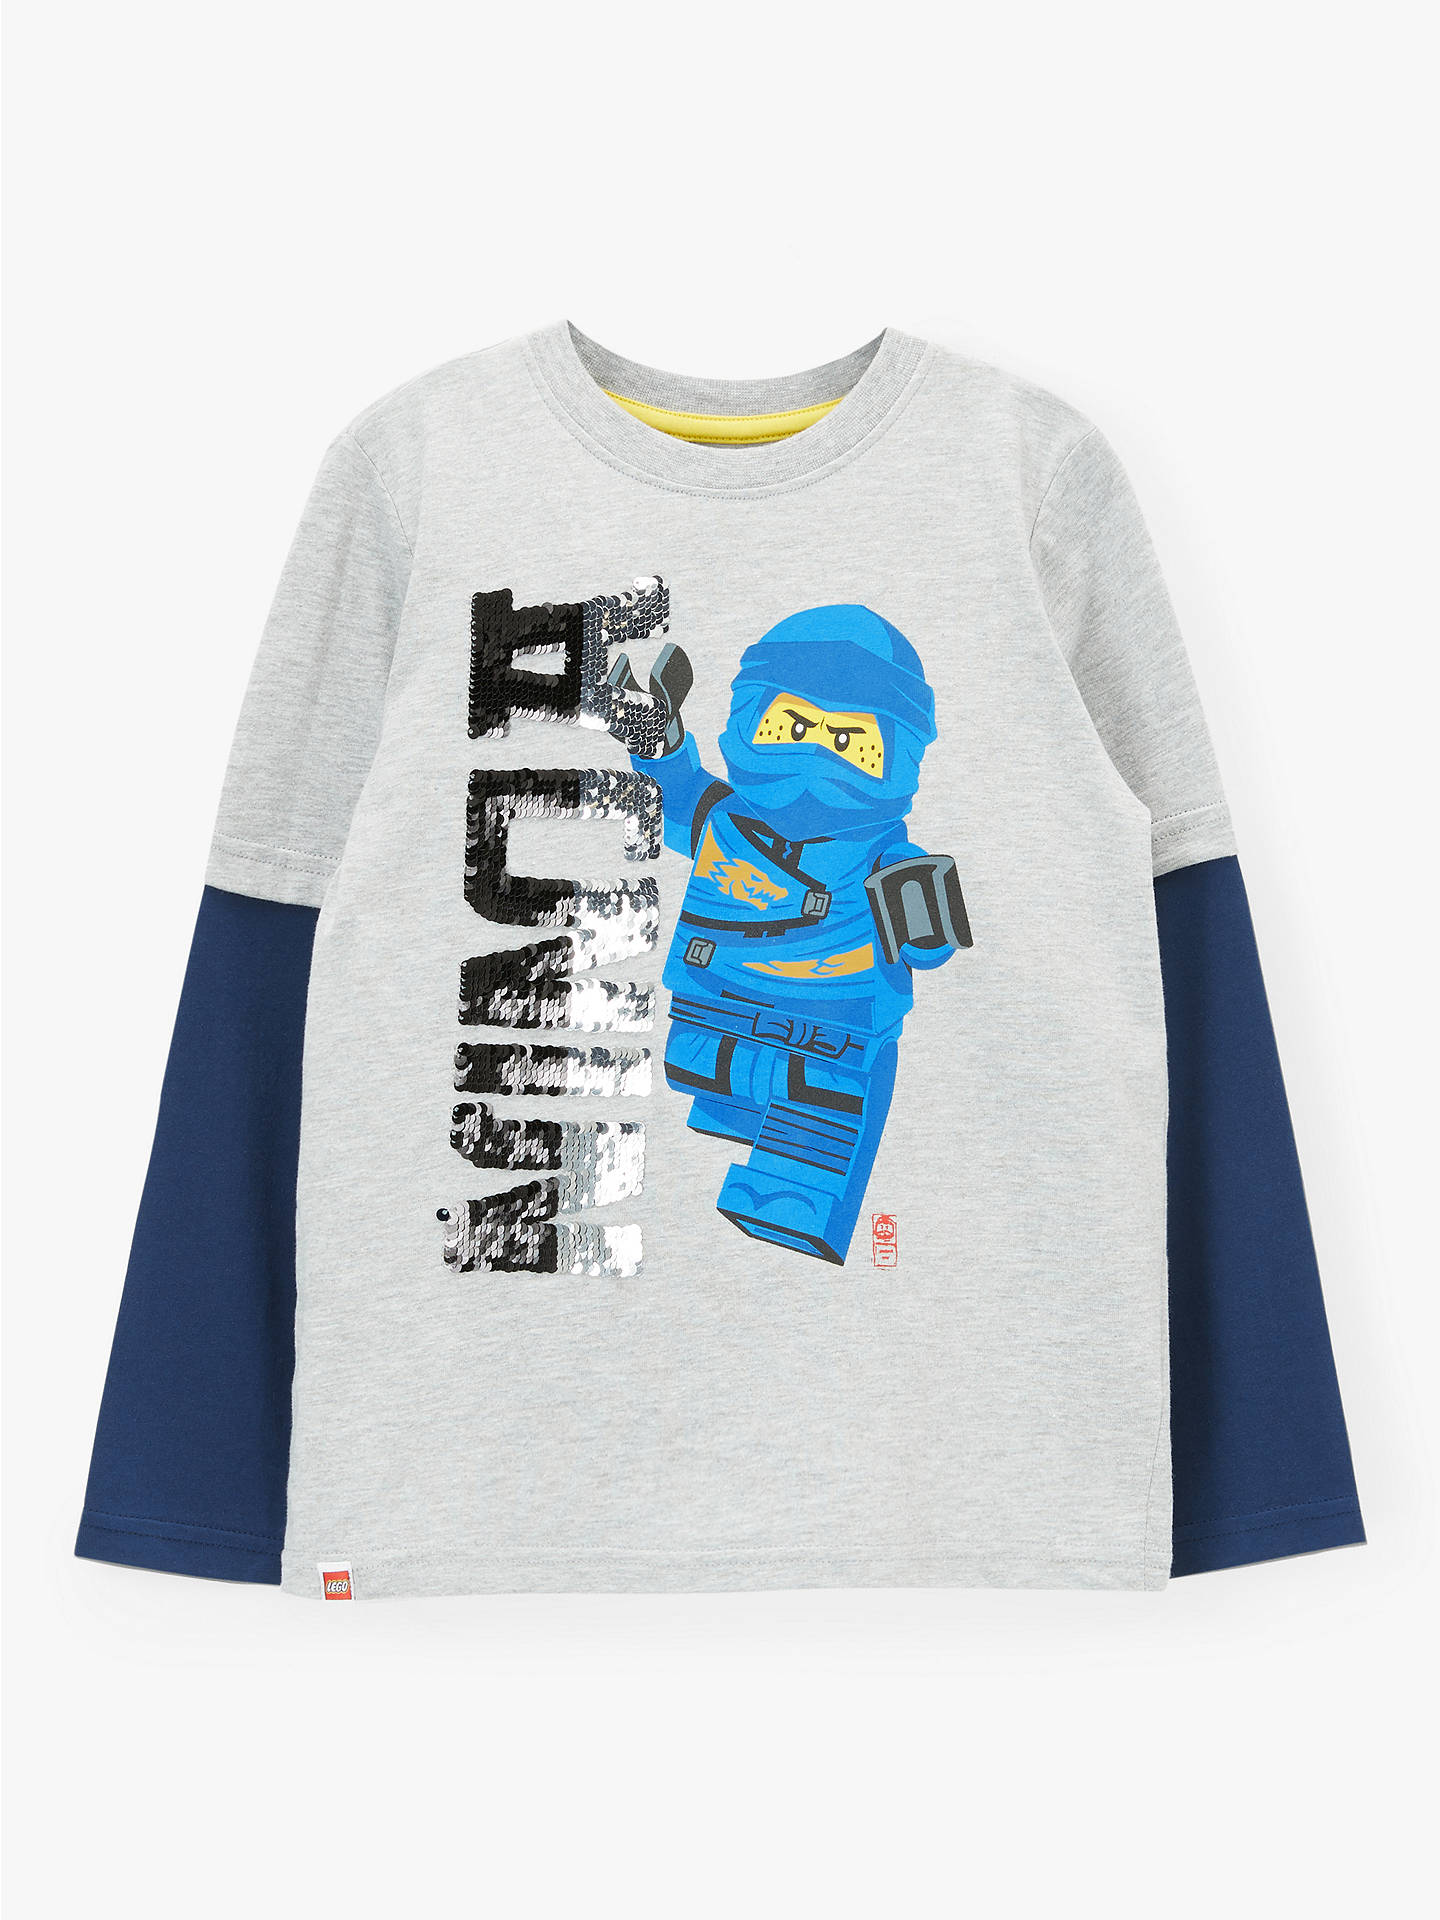 50% ceny sklep dostać nowe LEGO Boys' Ninjago Sequin T-Shirt, Grey at John Lewis & Partners